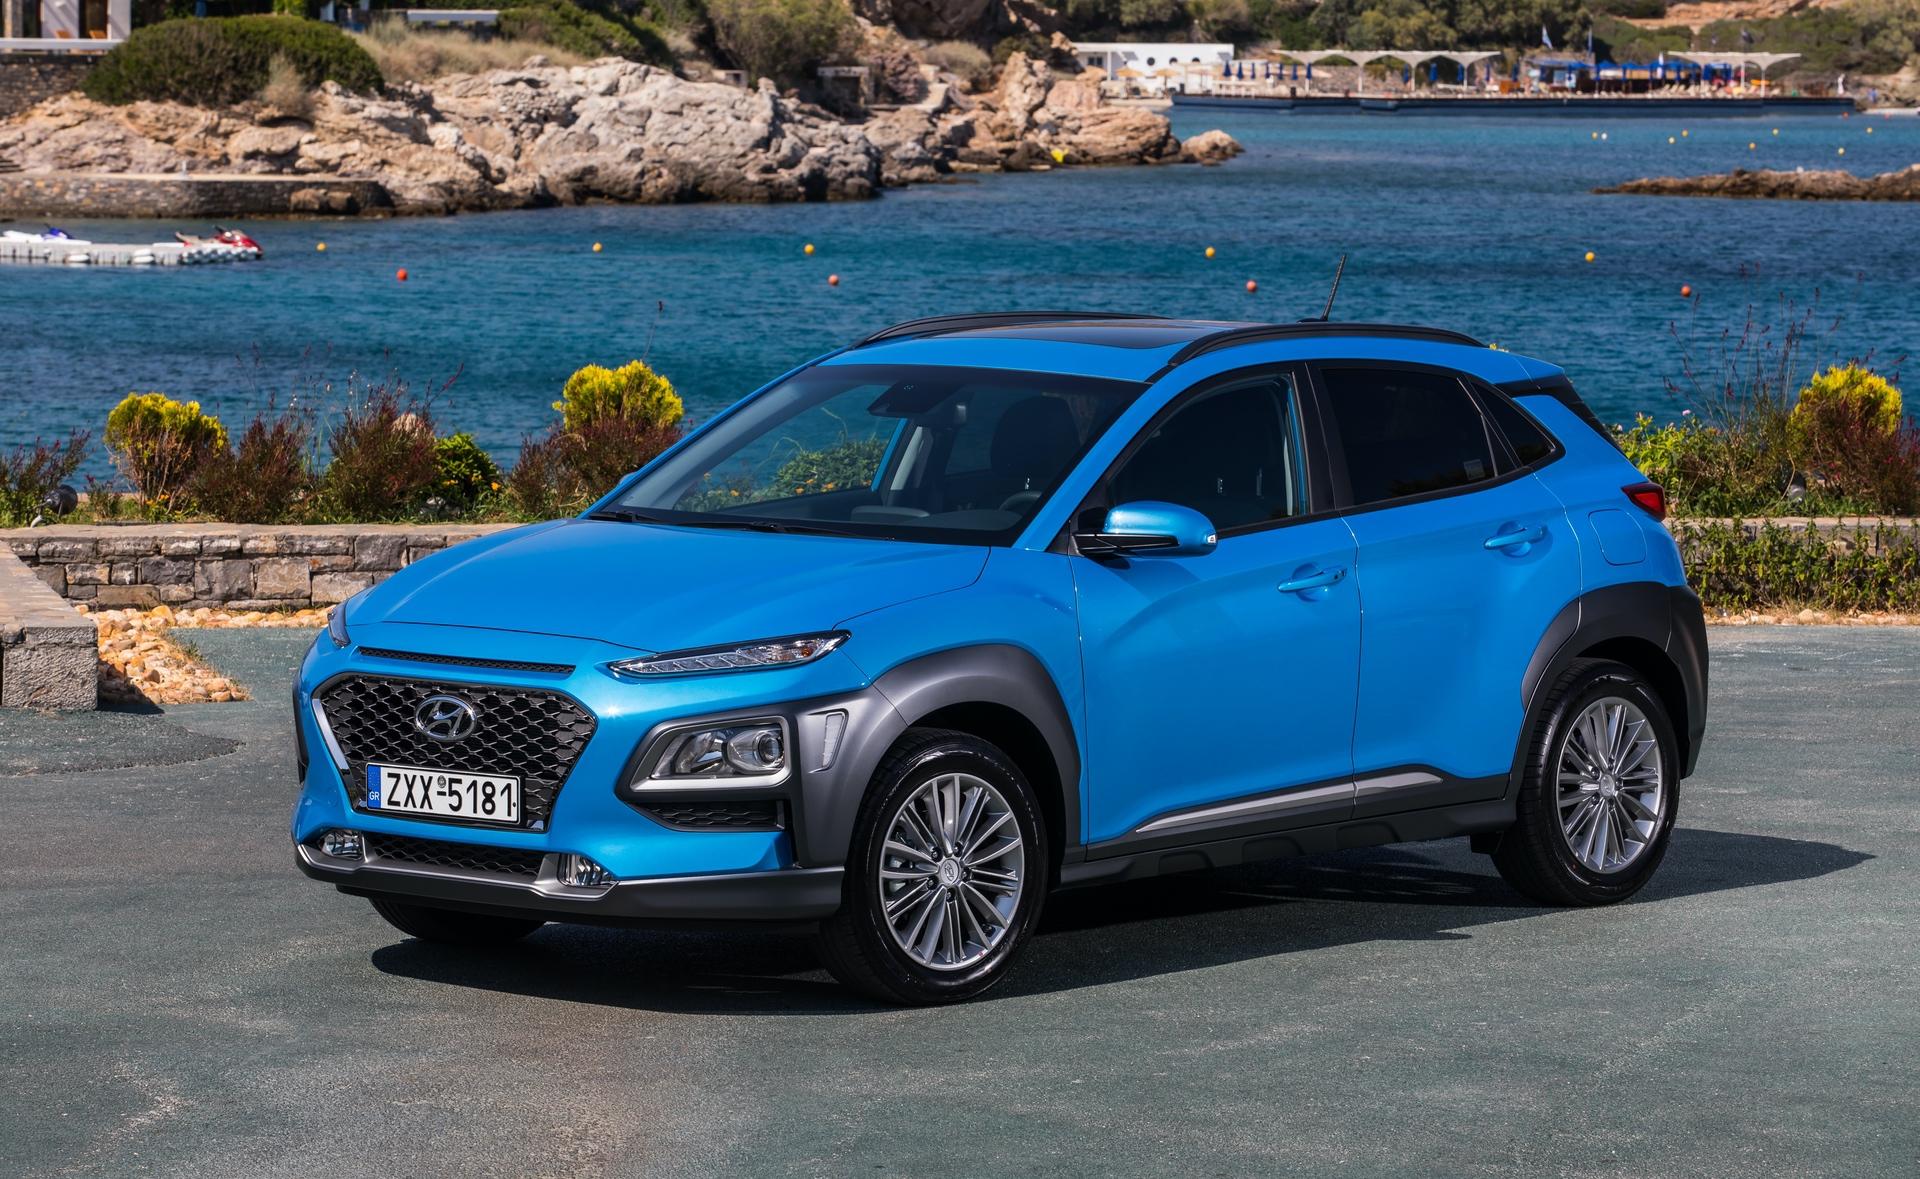 Hyundai_Kona_greek_presskit_0010